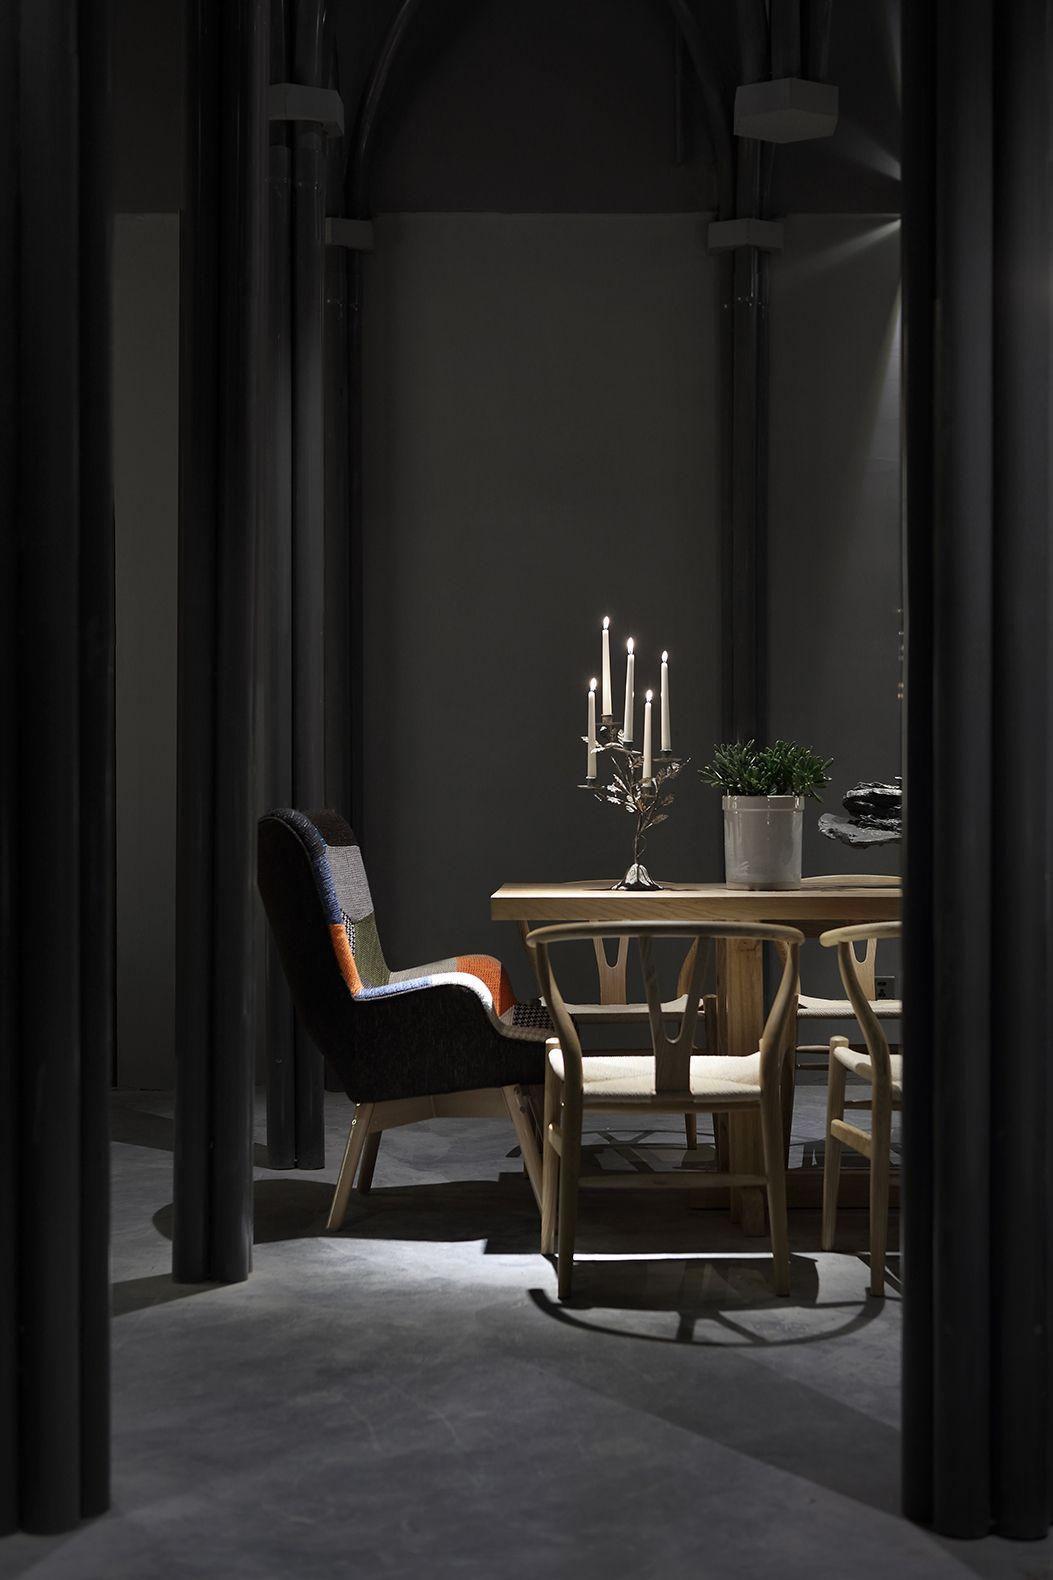 Home Interior Design Game Online: Gallery Of Mystical Game / Feel Design - 4